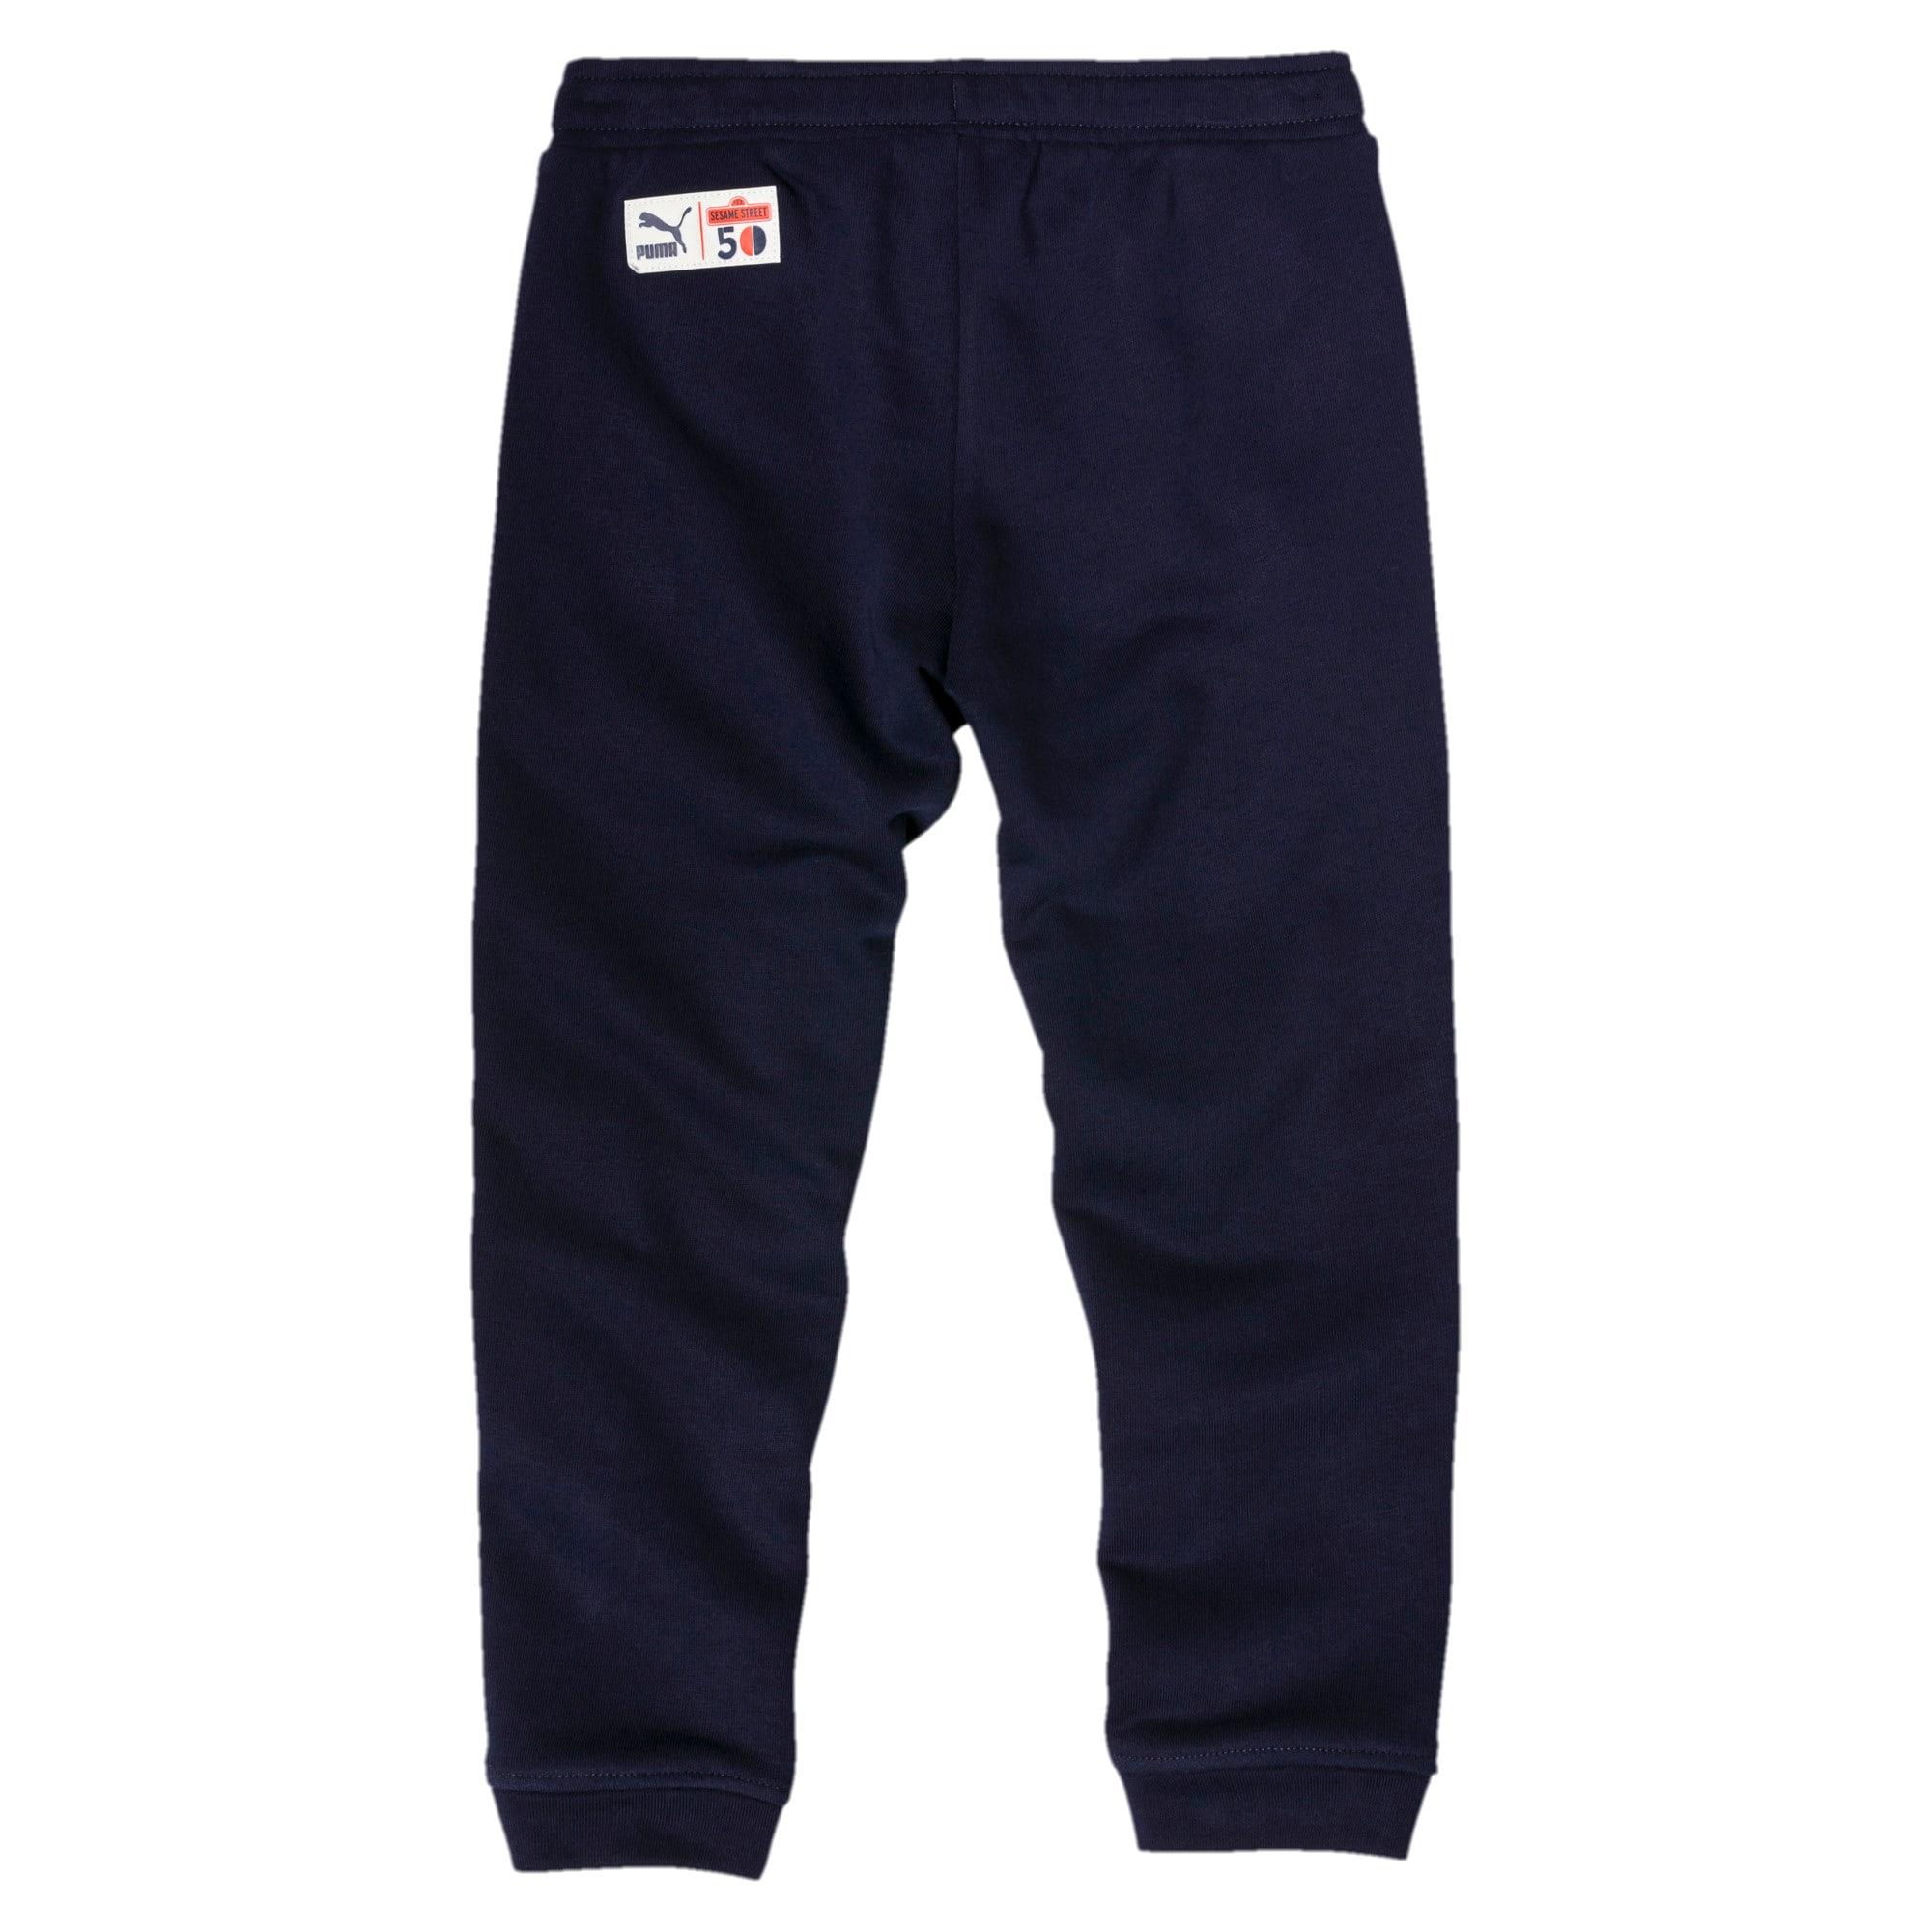 Thumbnail 2 of Sesame Street Knitted Boys' Pants, Peacoat, medium